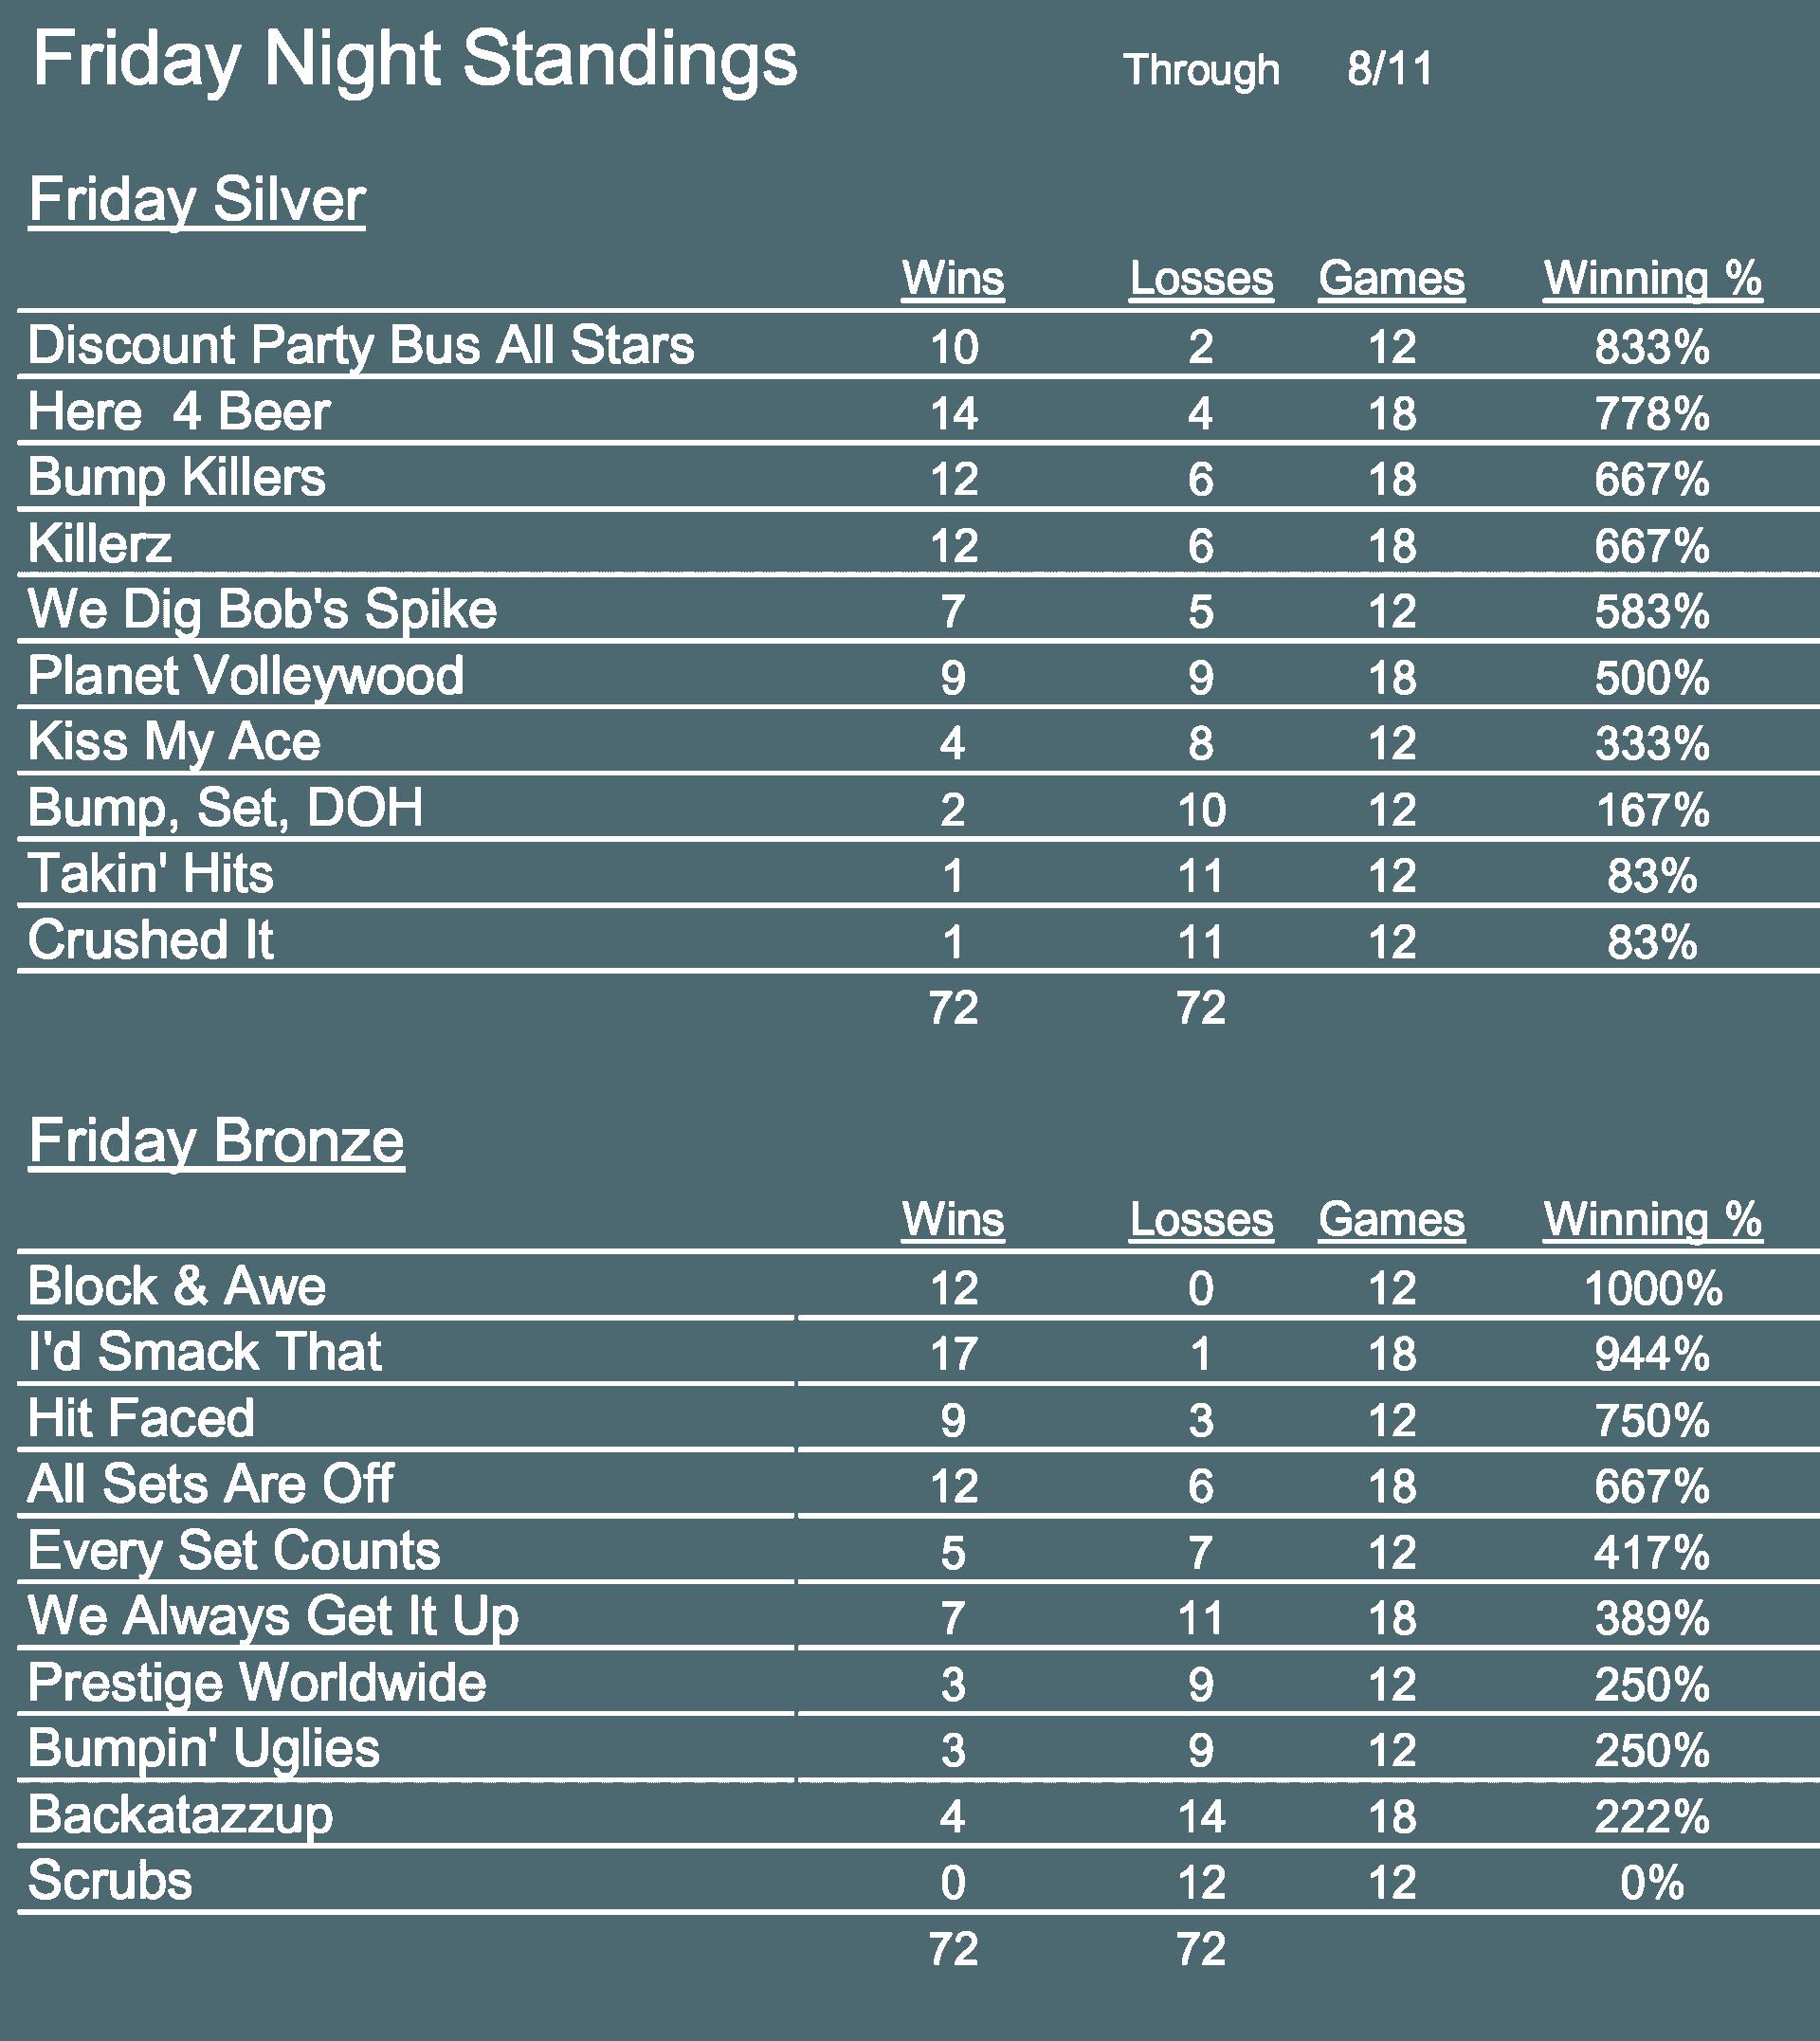 Friday Night Standings